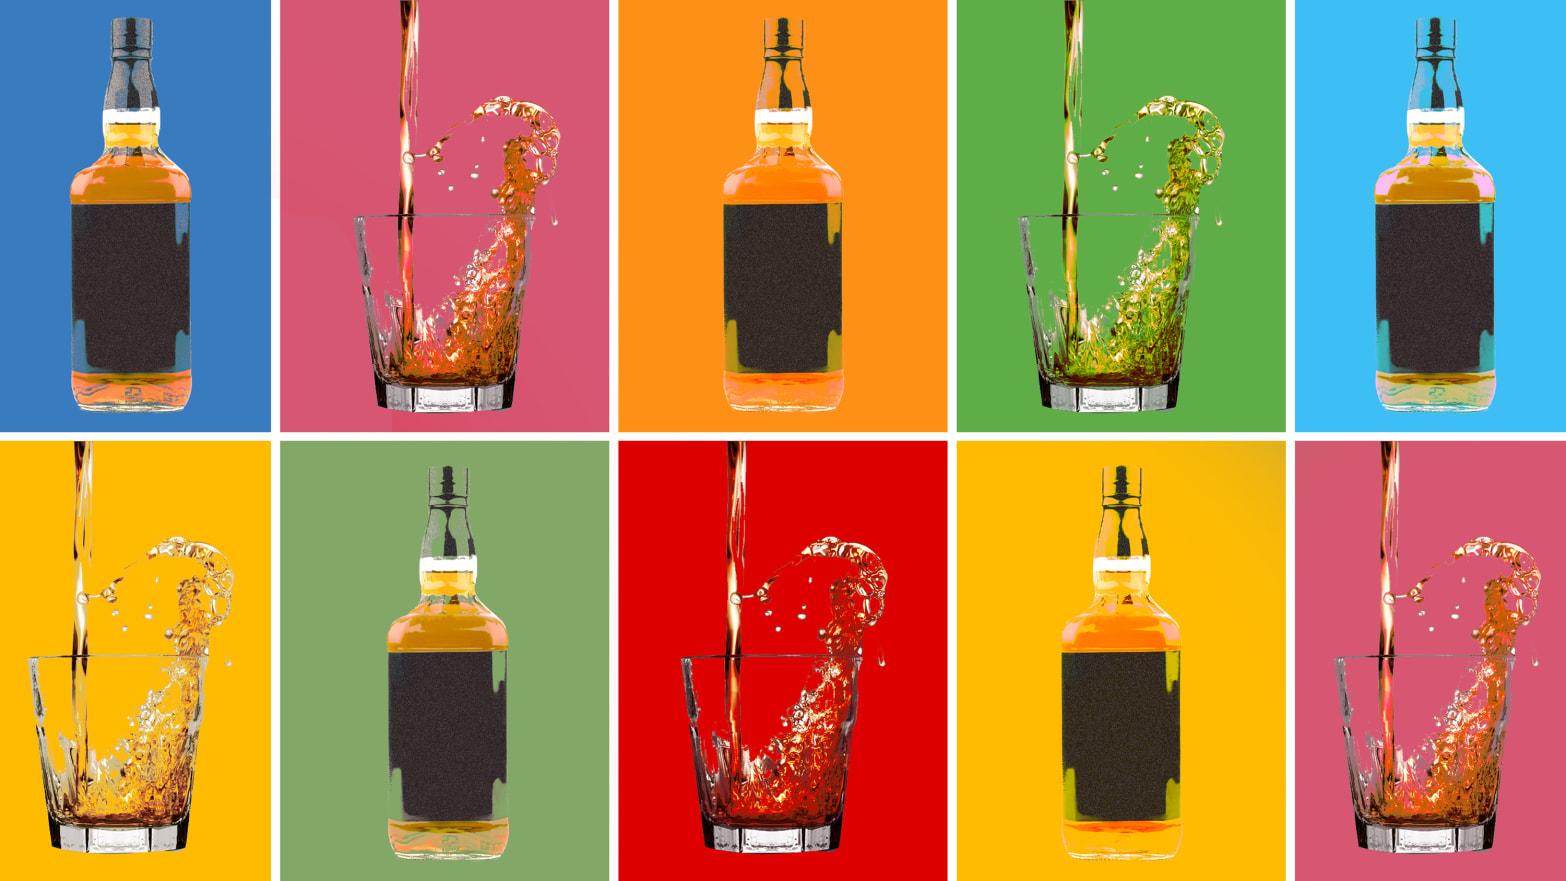 Pushing the Boundaries of Single Malt Scotch Whisky